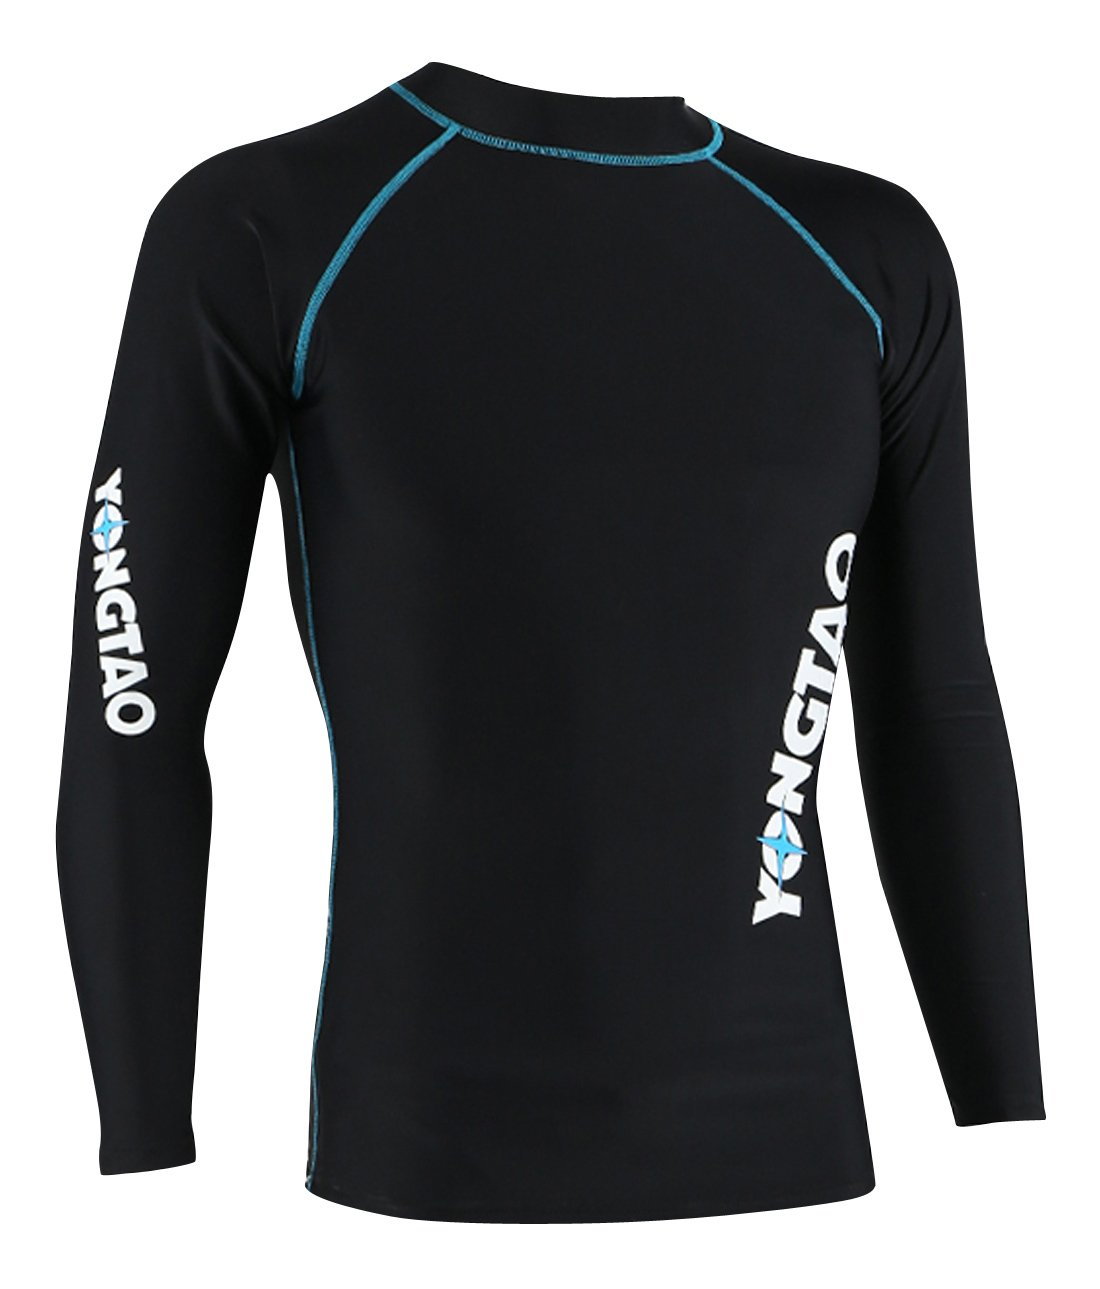 YONGTAO Men Neoprene Quick Dry Swimming Skin Long Sleeve Diving Rash Guard Sun Protective for Canoeing Kitesufing - S